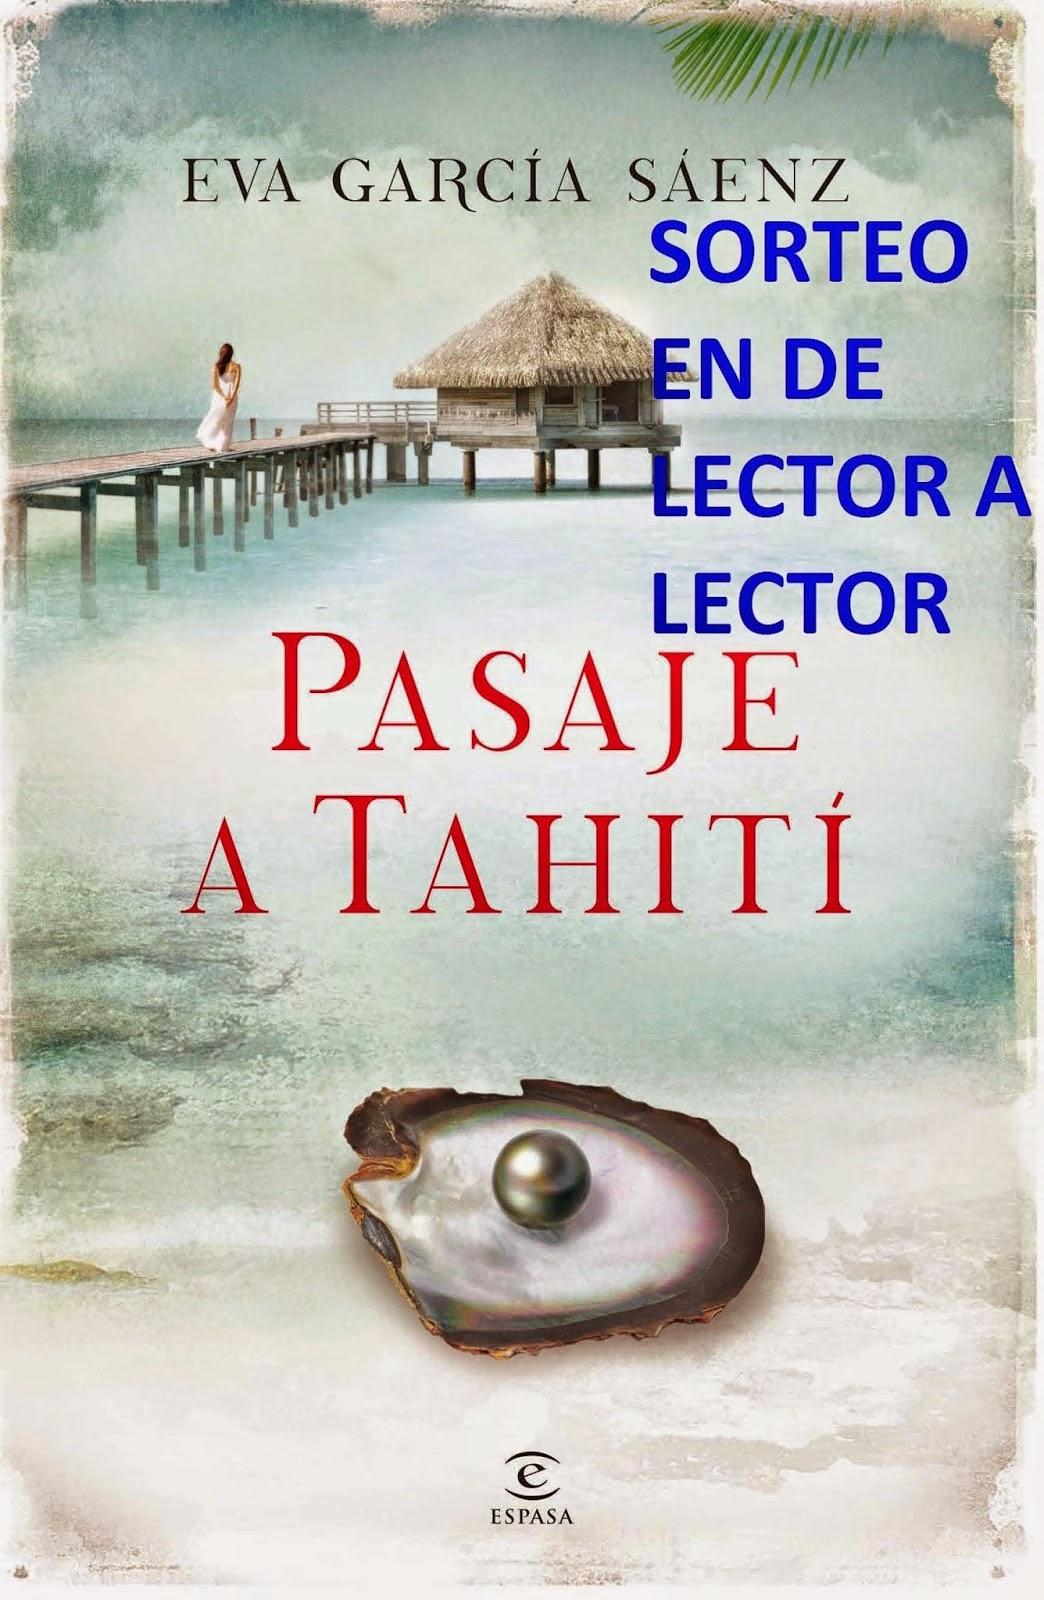 http://leyendoyleyendo.blogspot.com.es/2014/06/sorteo-pasaje-tahiti-eva-garcia-saenz.html